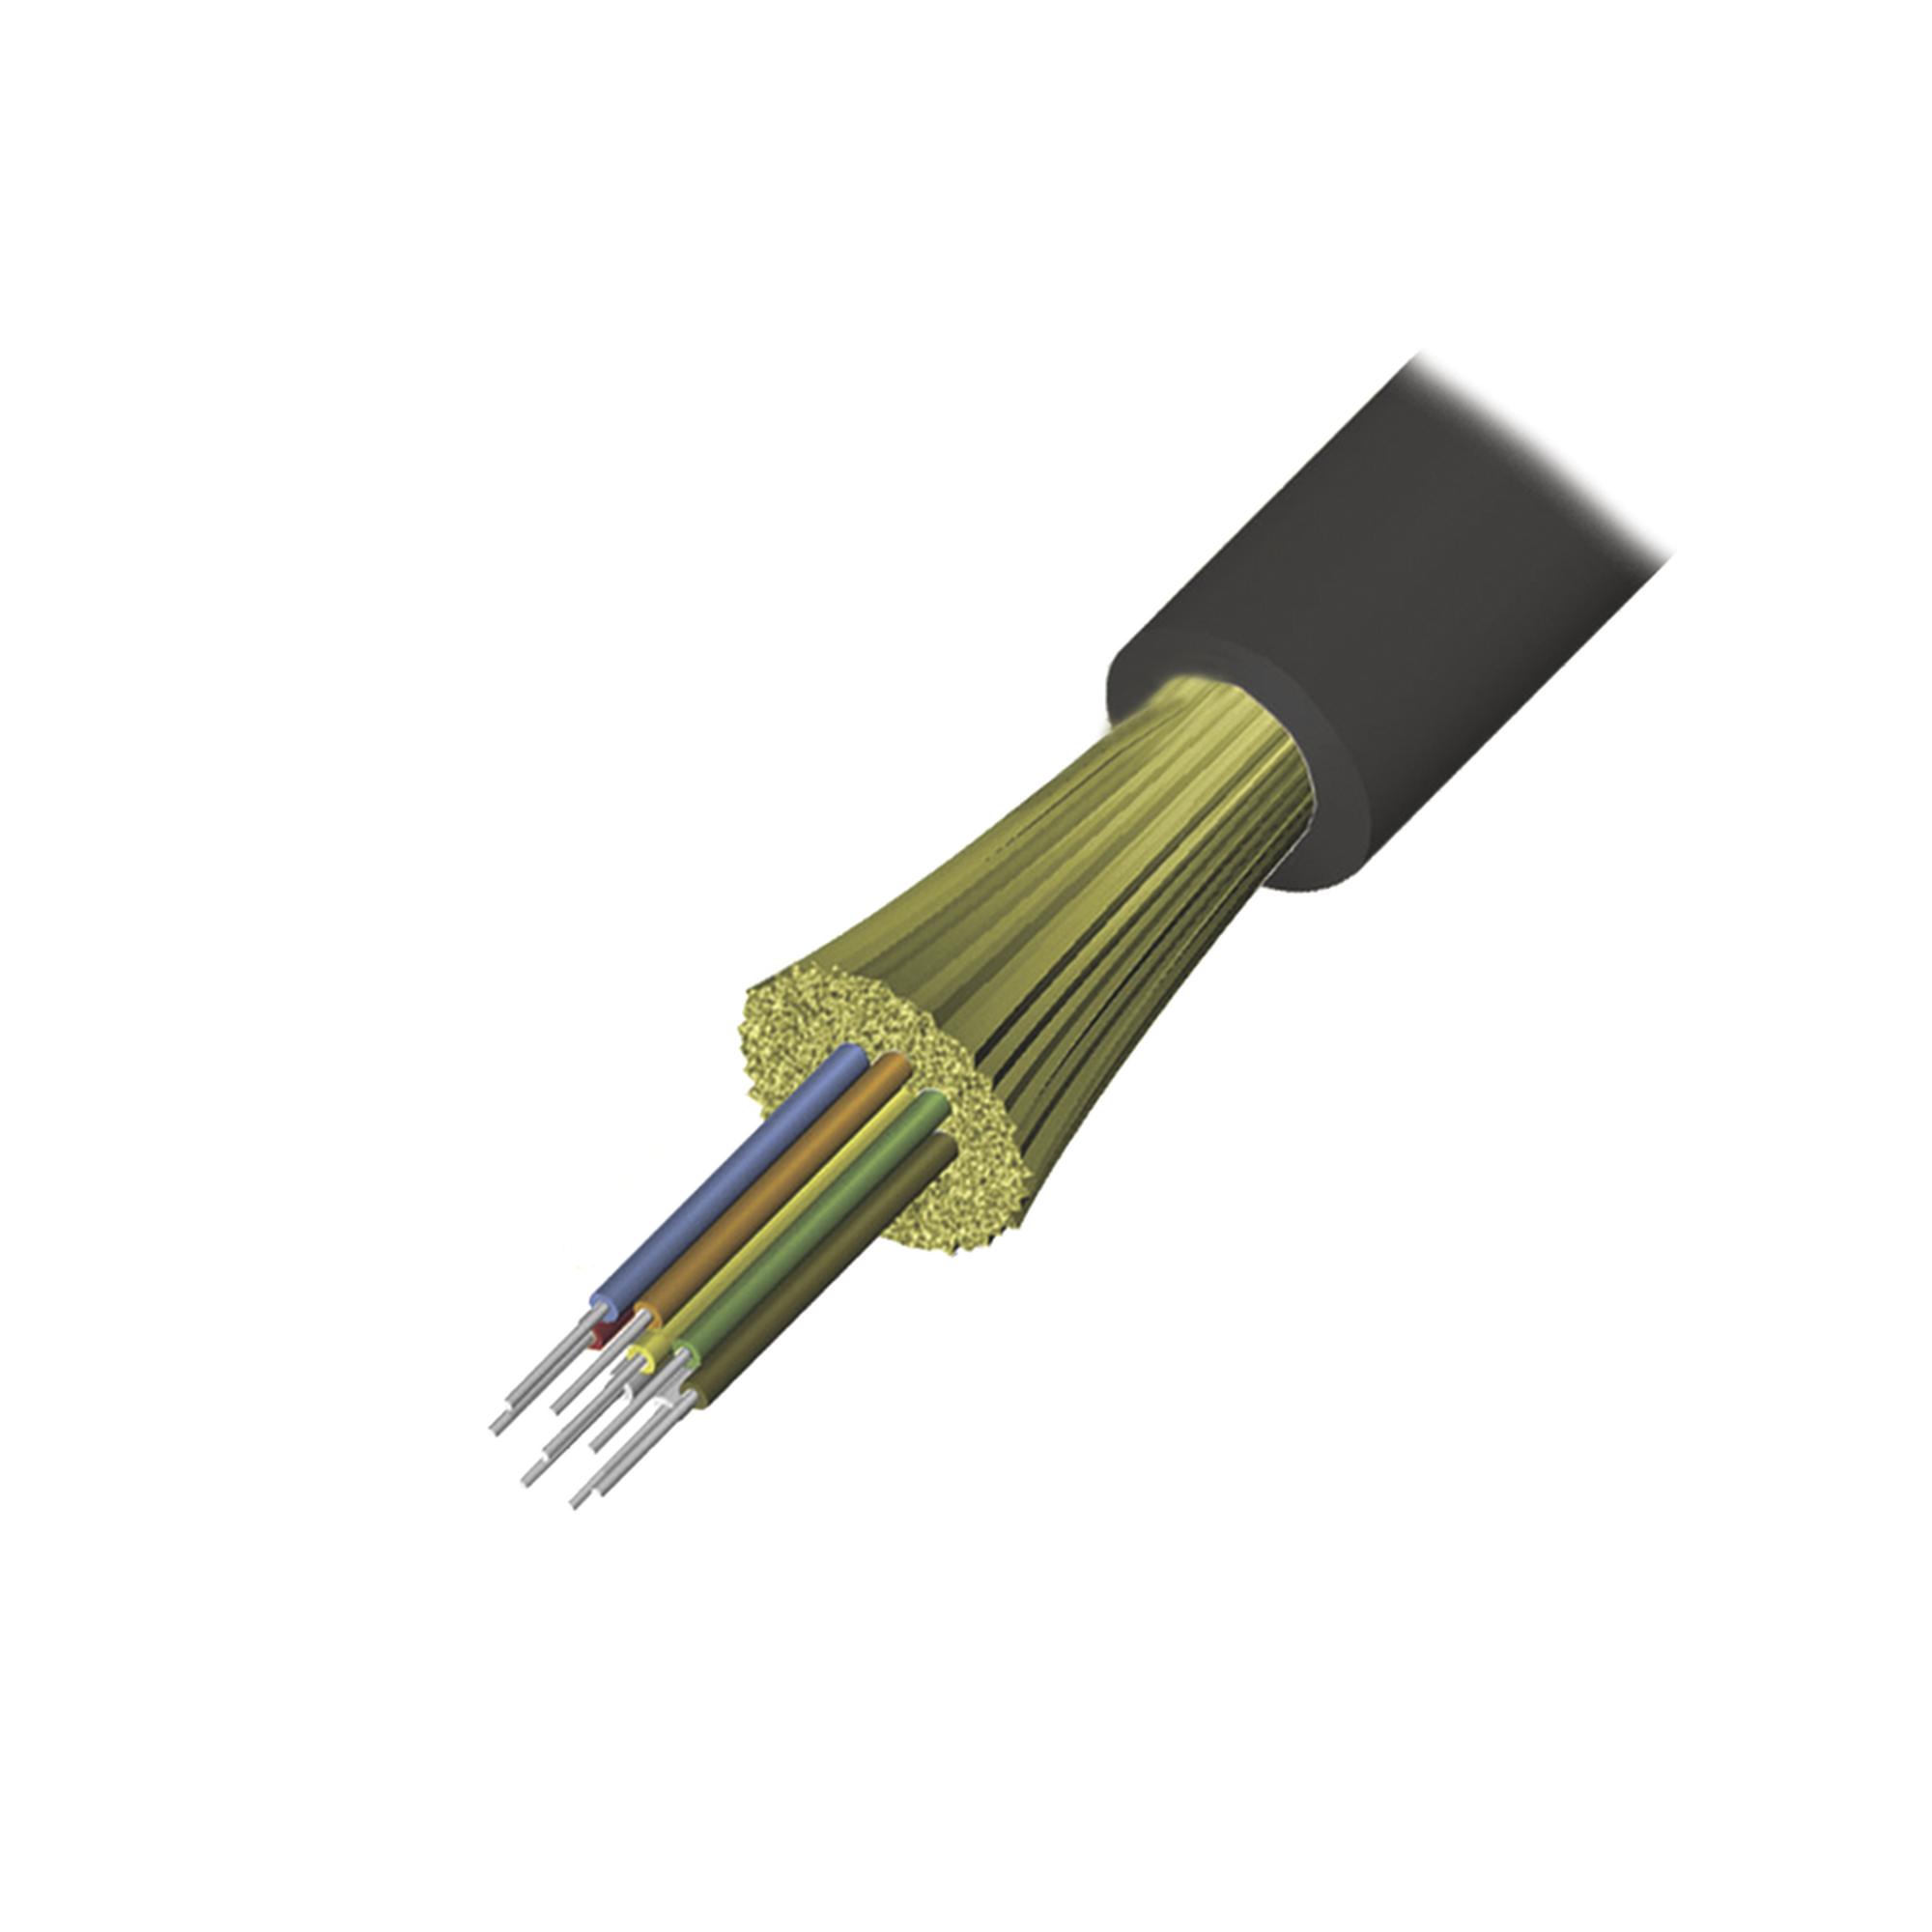 Cable de Fibra óptica de 12 hilos, Interior/Exterior, Tight Buffer, No Conductiva (Dieléctrica), LS0H, Multimodo OM4 50/125 optimizada, 1 Metro